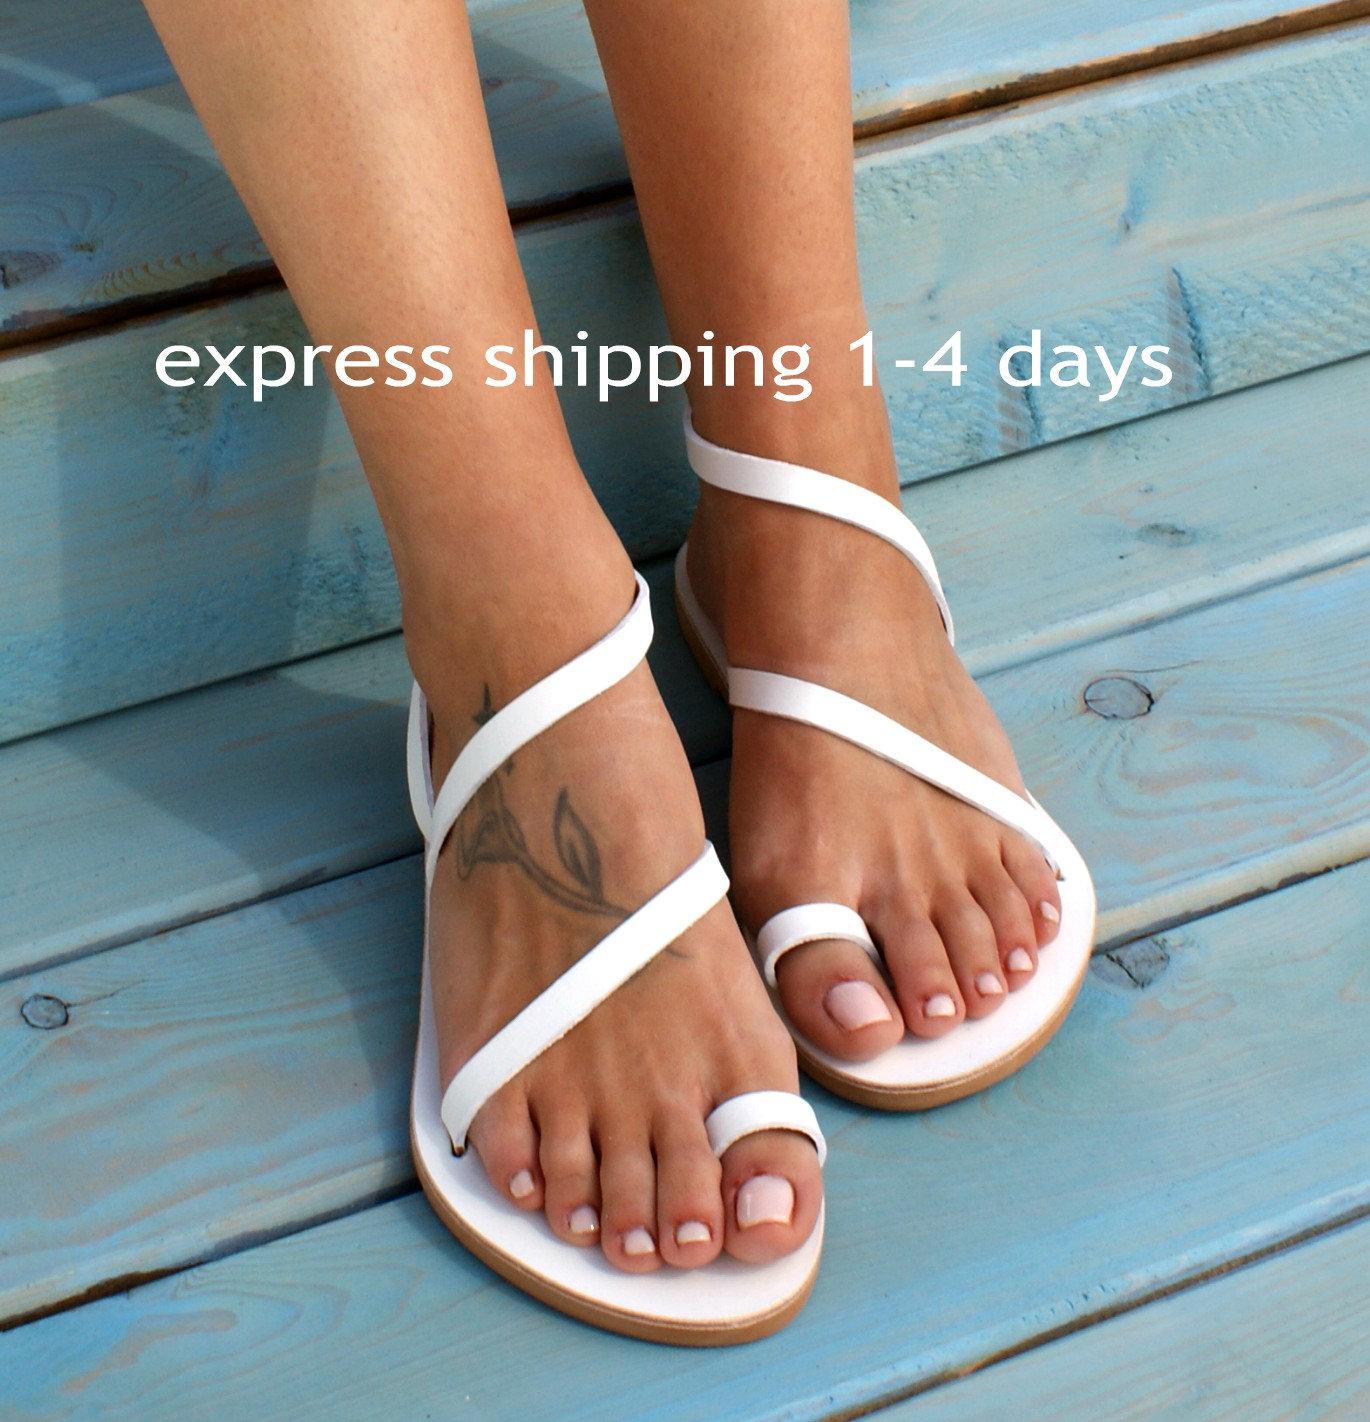 7a4ce8c16515 CLEOPATRA 4 ancient Greek leather sandals  classic leather sandals   handmade sandals  strappy sandals  white sandals  toe ring sandals